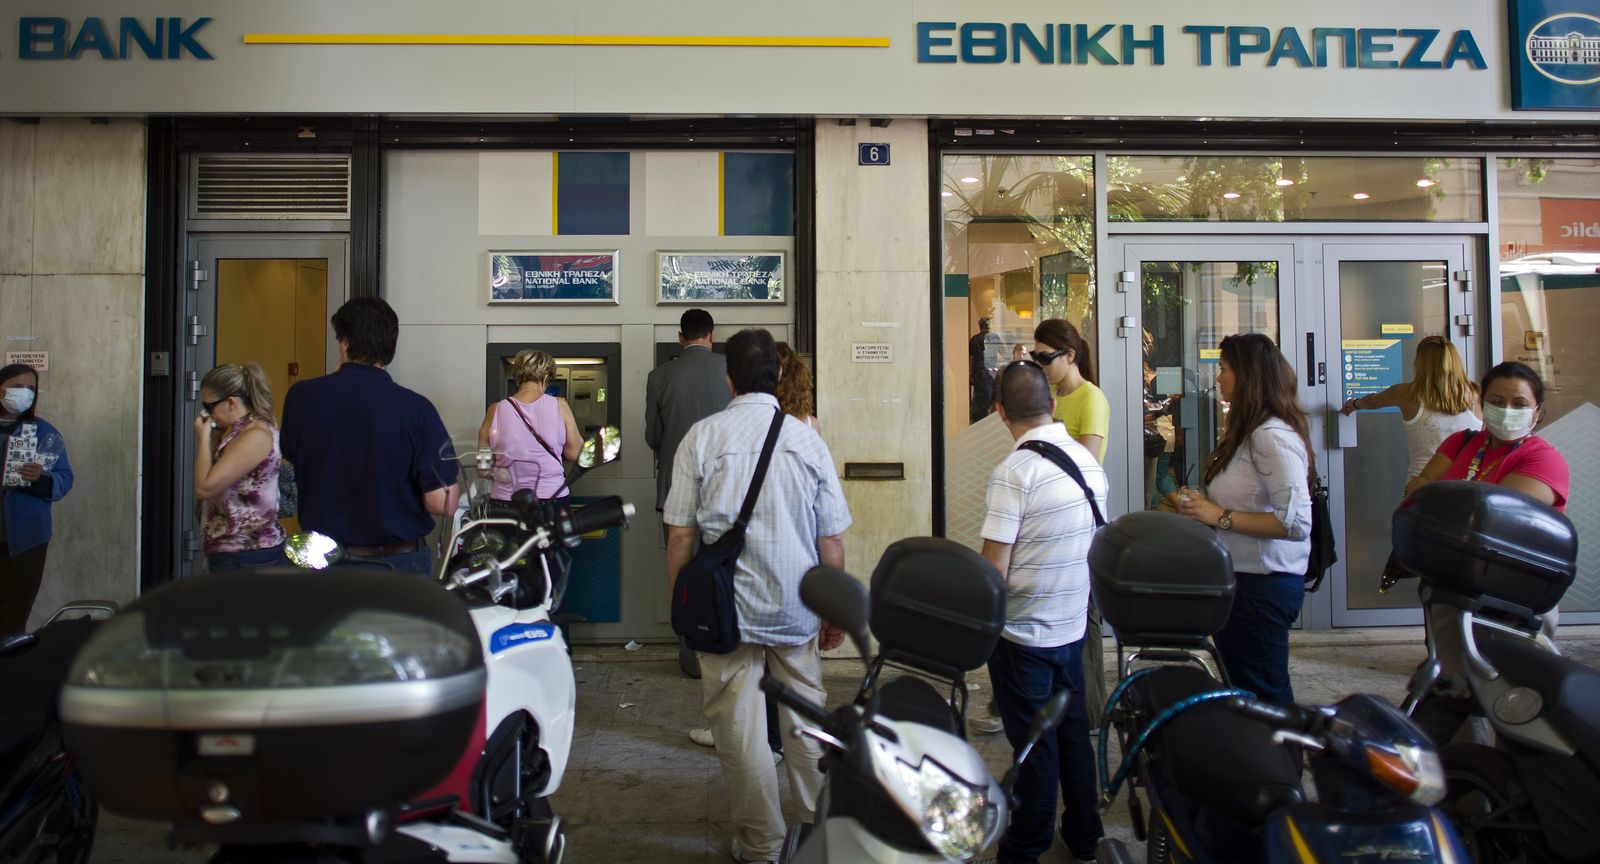 Griechenland/ krise/ Geldautomat